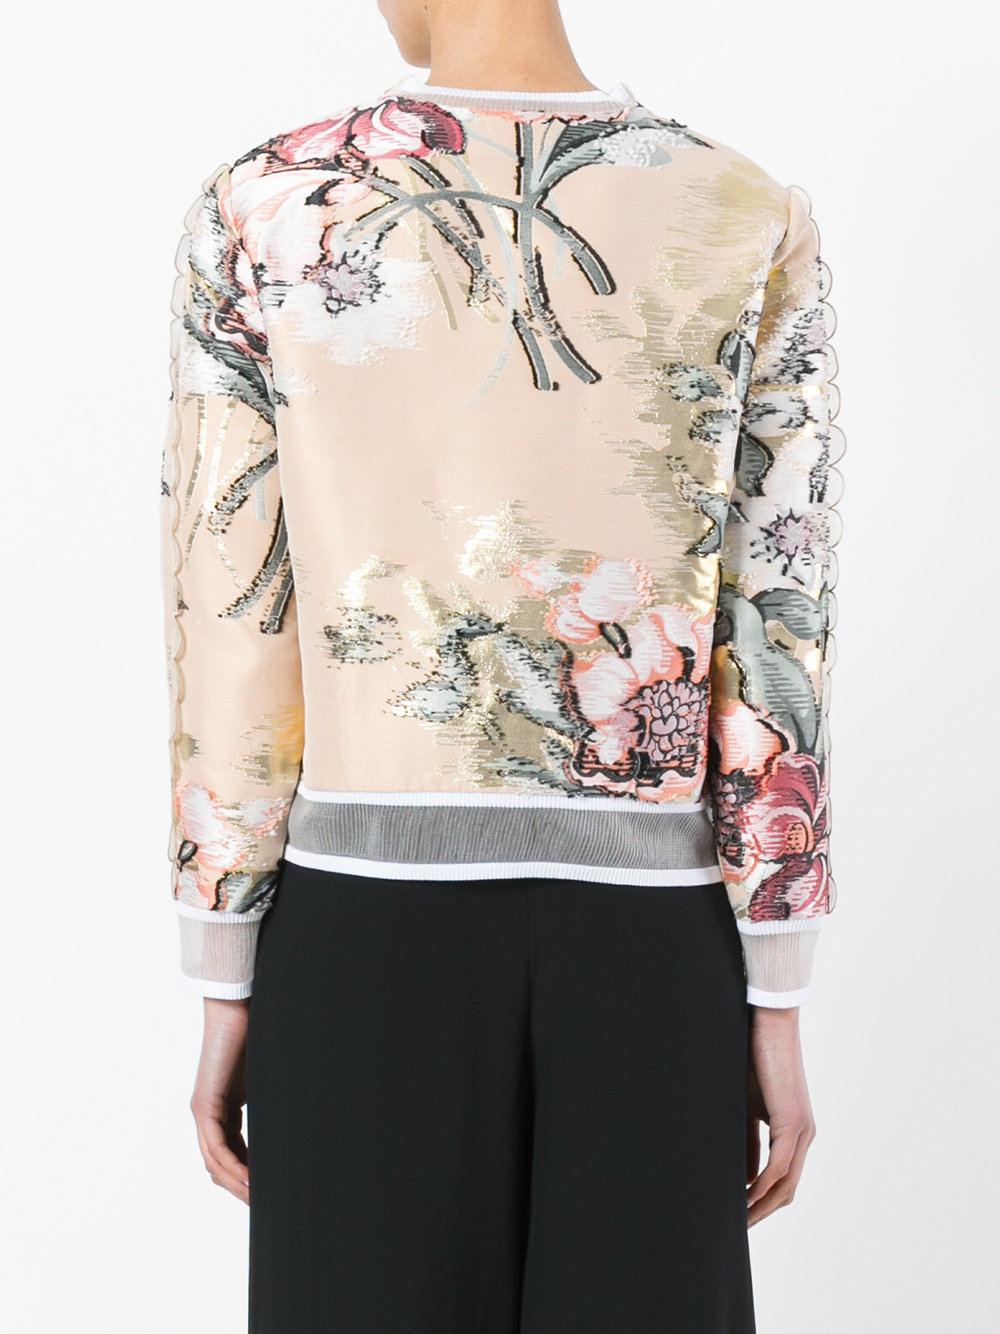 nude silk flower embroidery top FENDI |  | FS6632-9VBF08U7